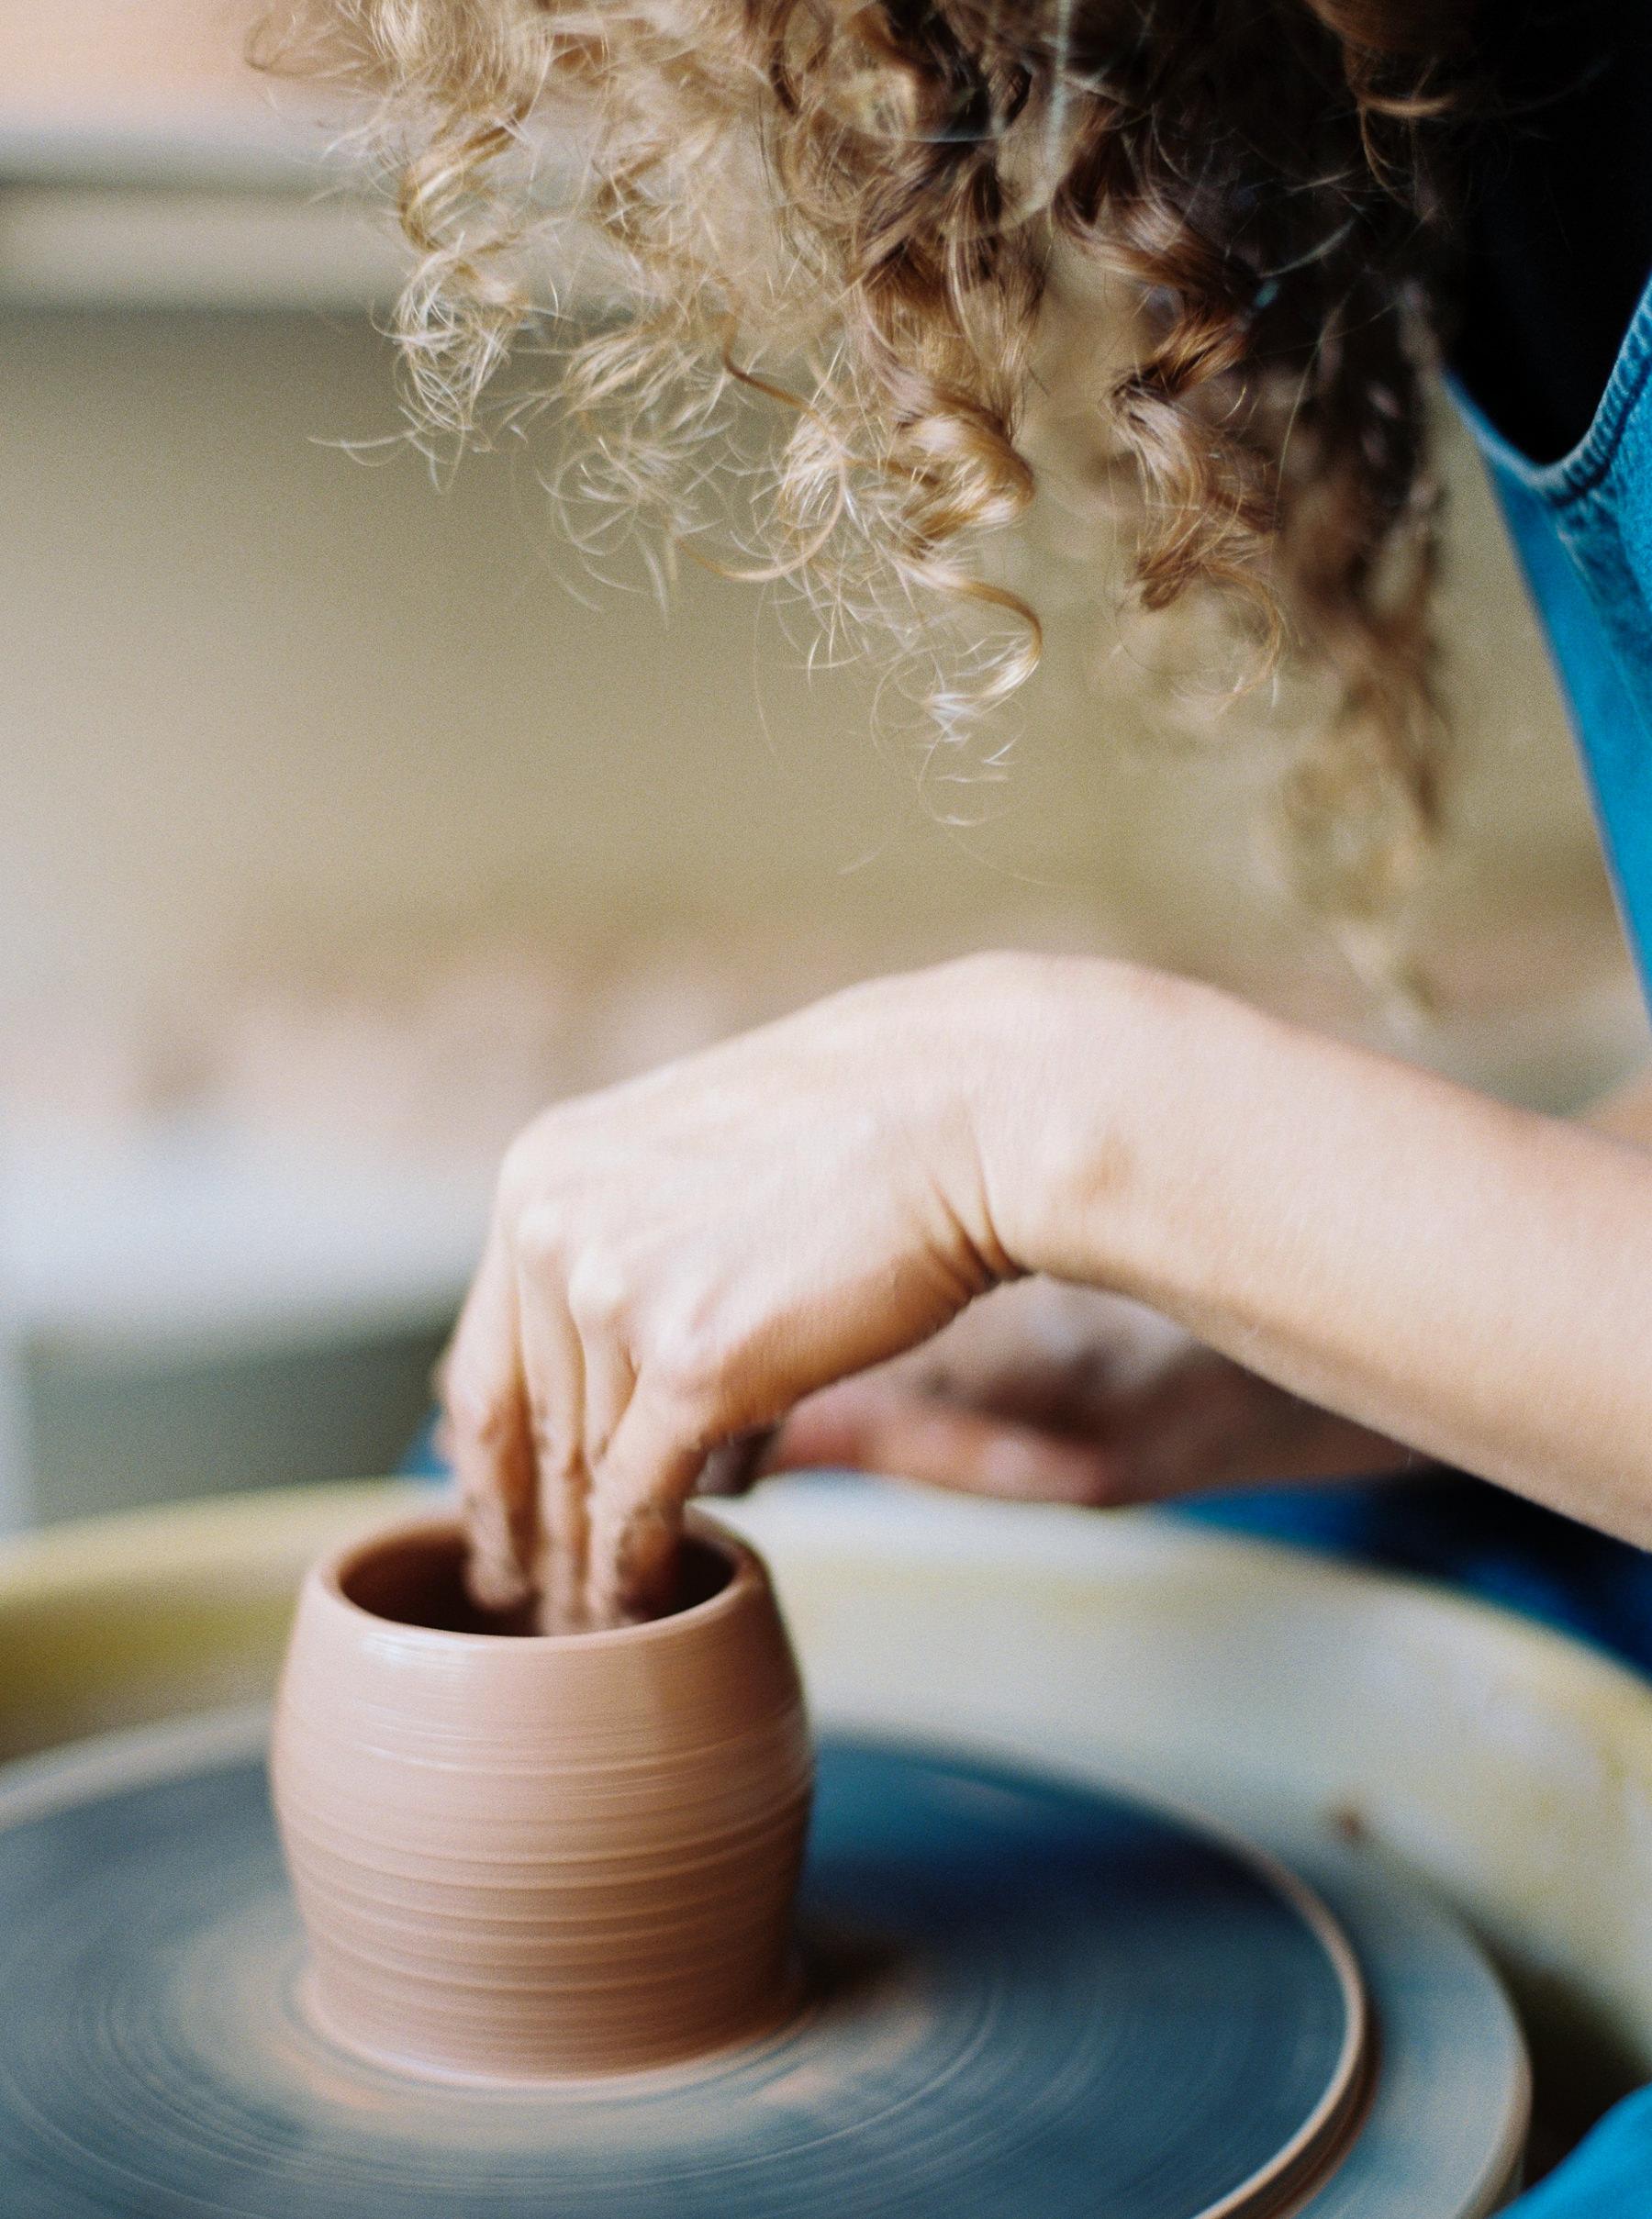 artistprofile-katherinemoes-pottery-annapeters-annapetersphoto-unearthing.tc-2.jpg